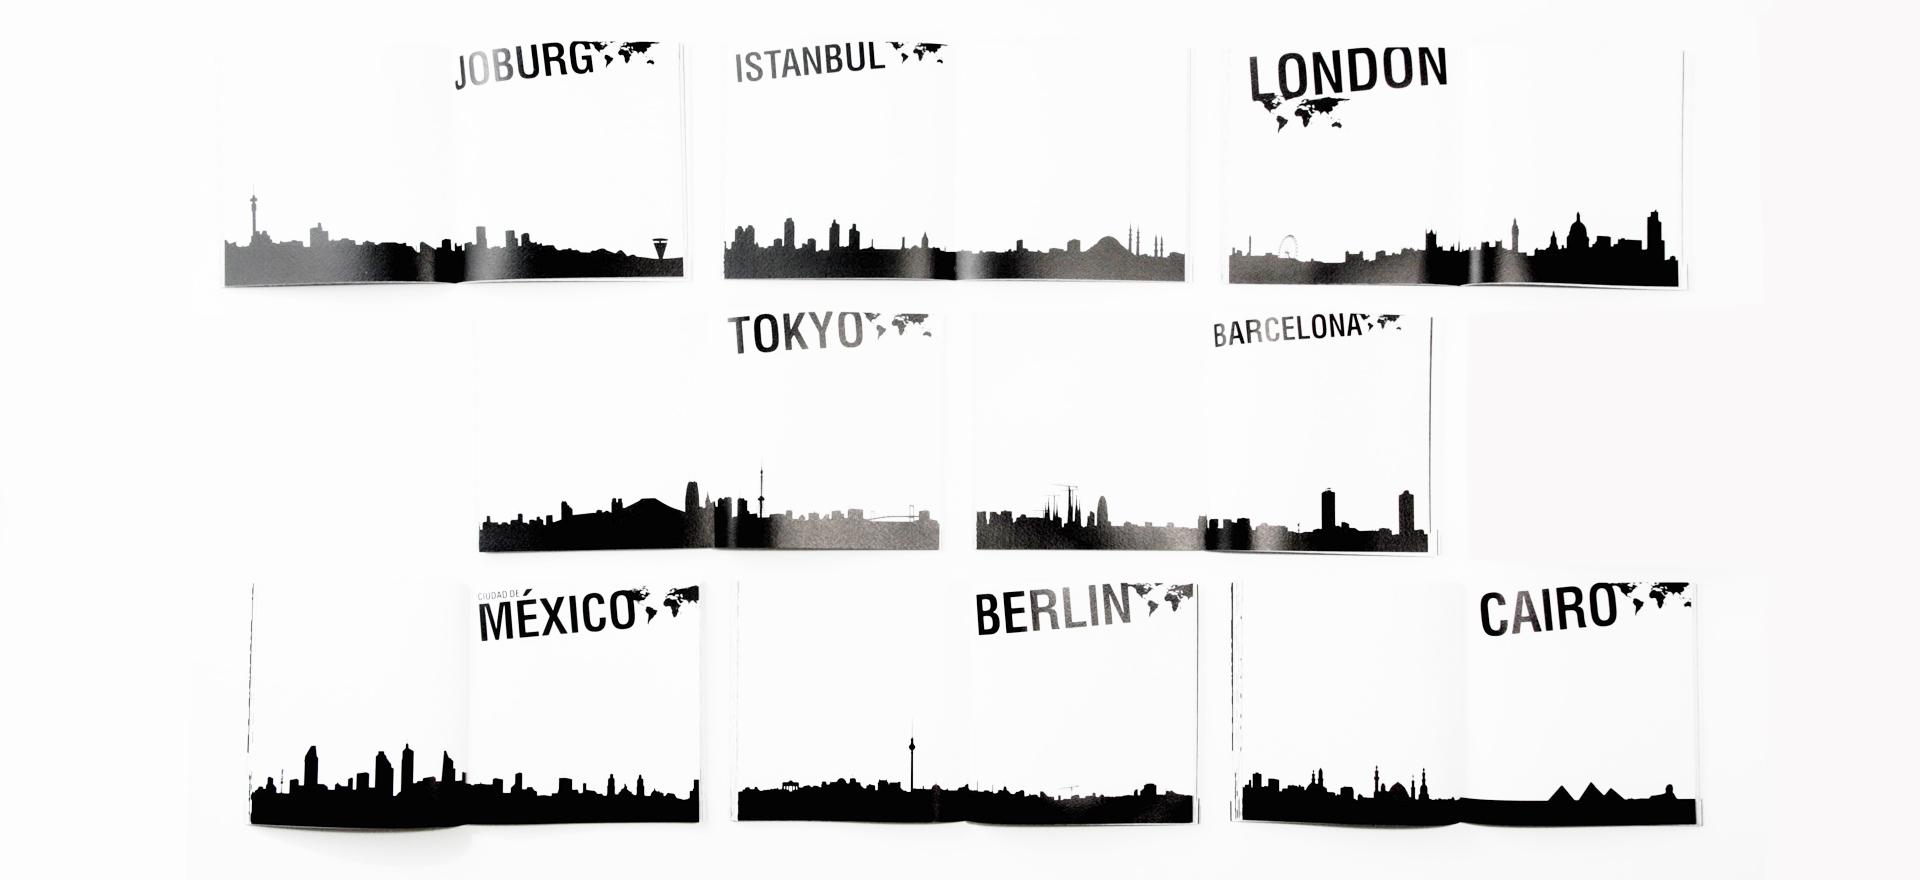 La Biennale di Venezia | Urban Design | Catalogues | Cities as models of sustainability | Mario Trimarchi Design | Fragile 1